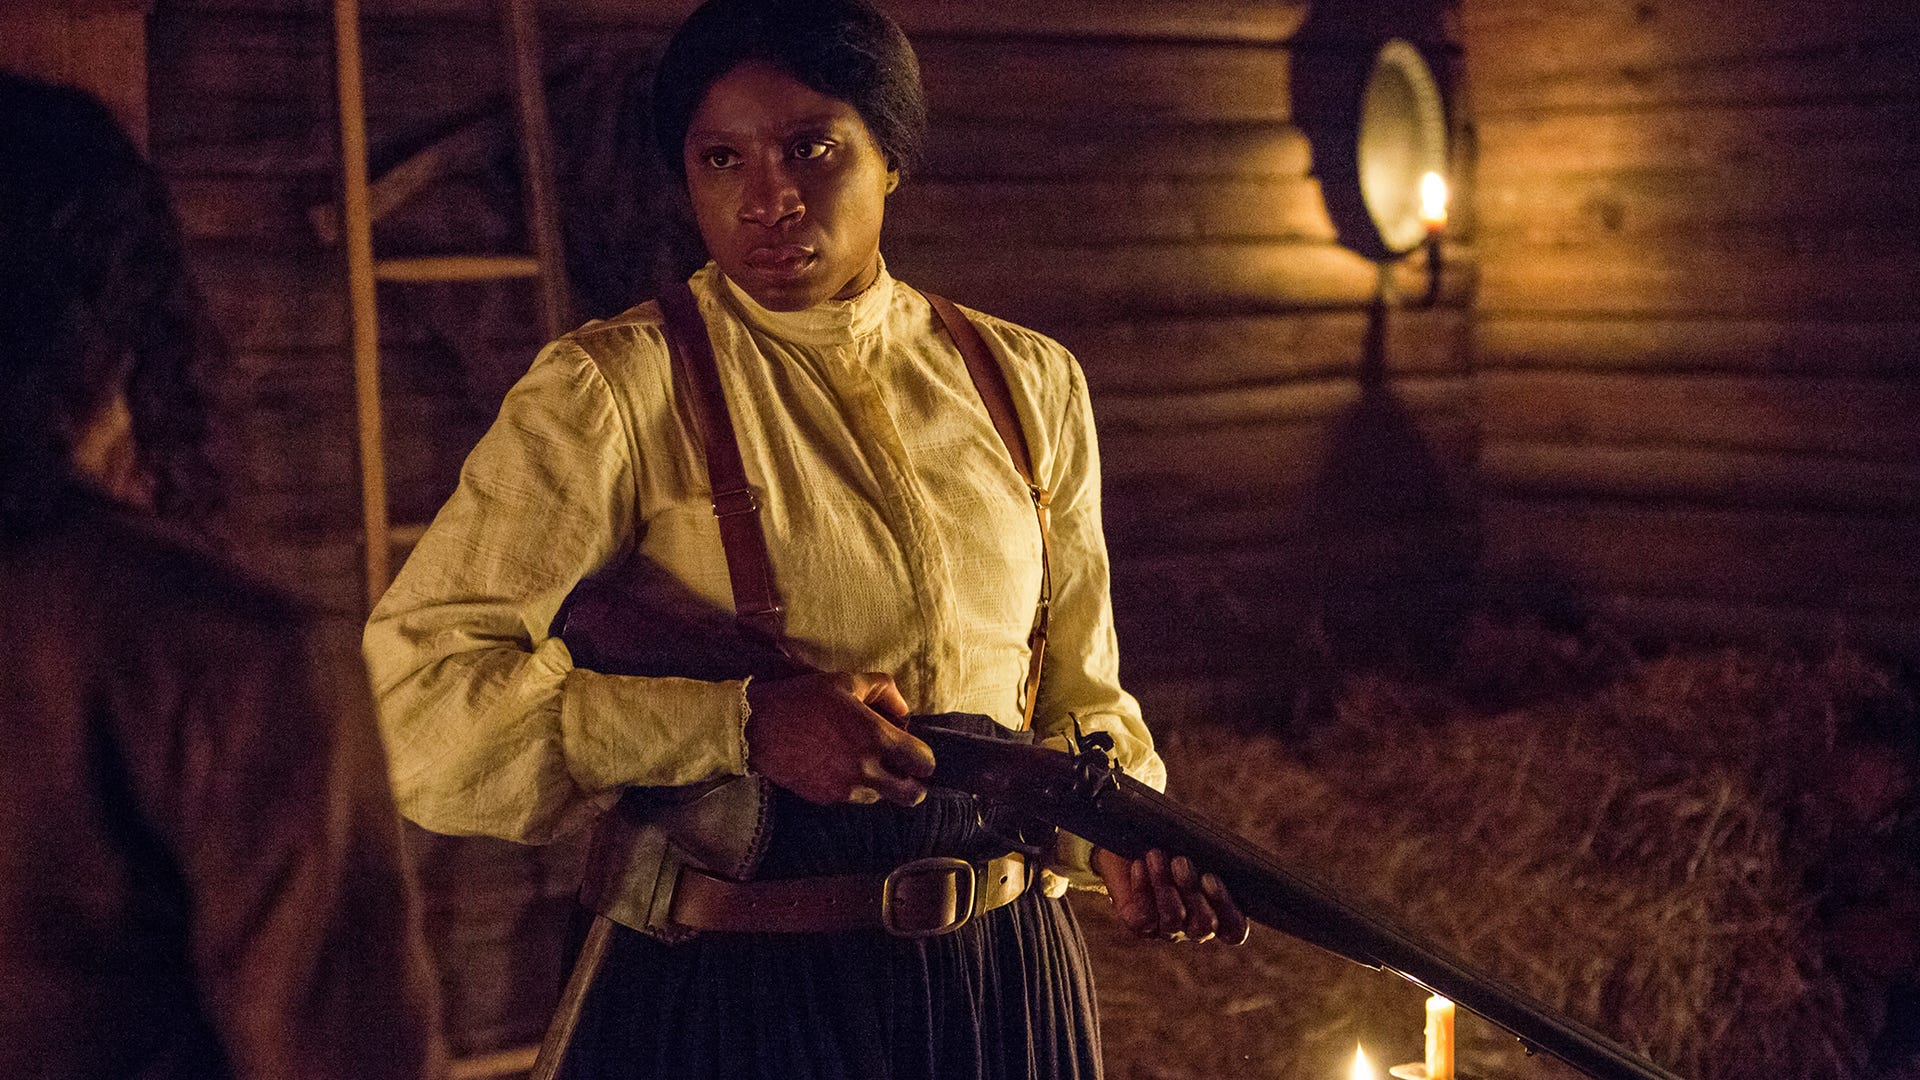 Aisha Hinds as Harriet Tubman, Underground